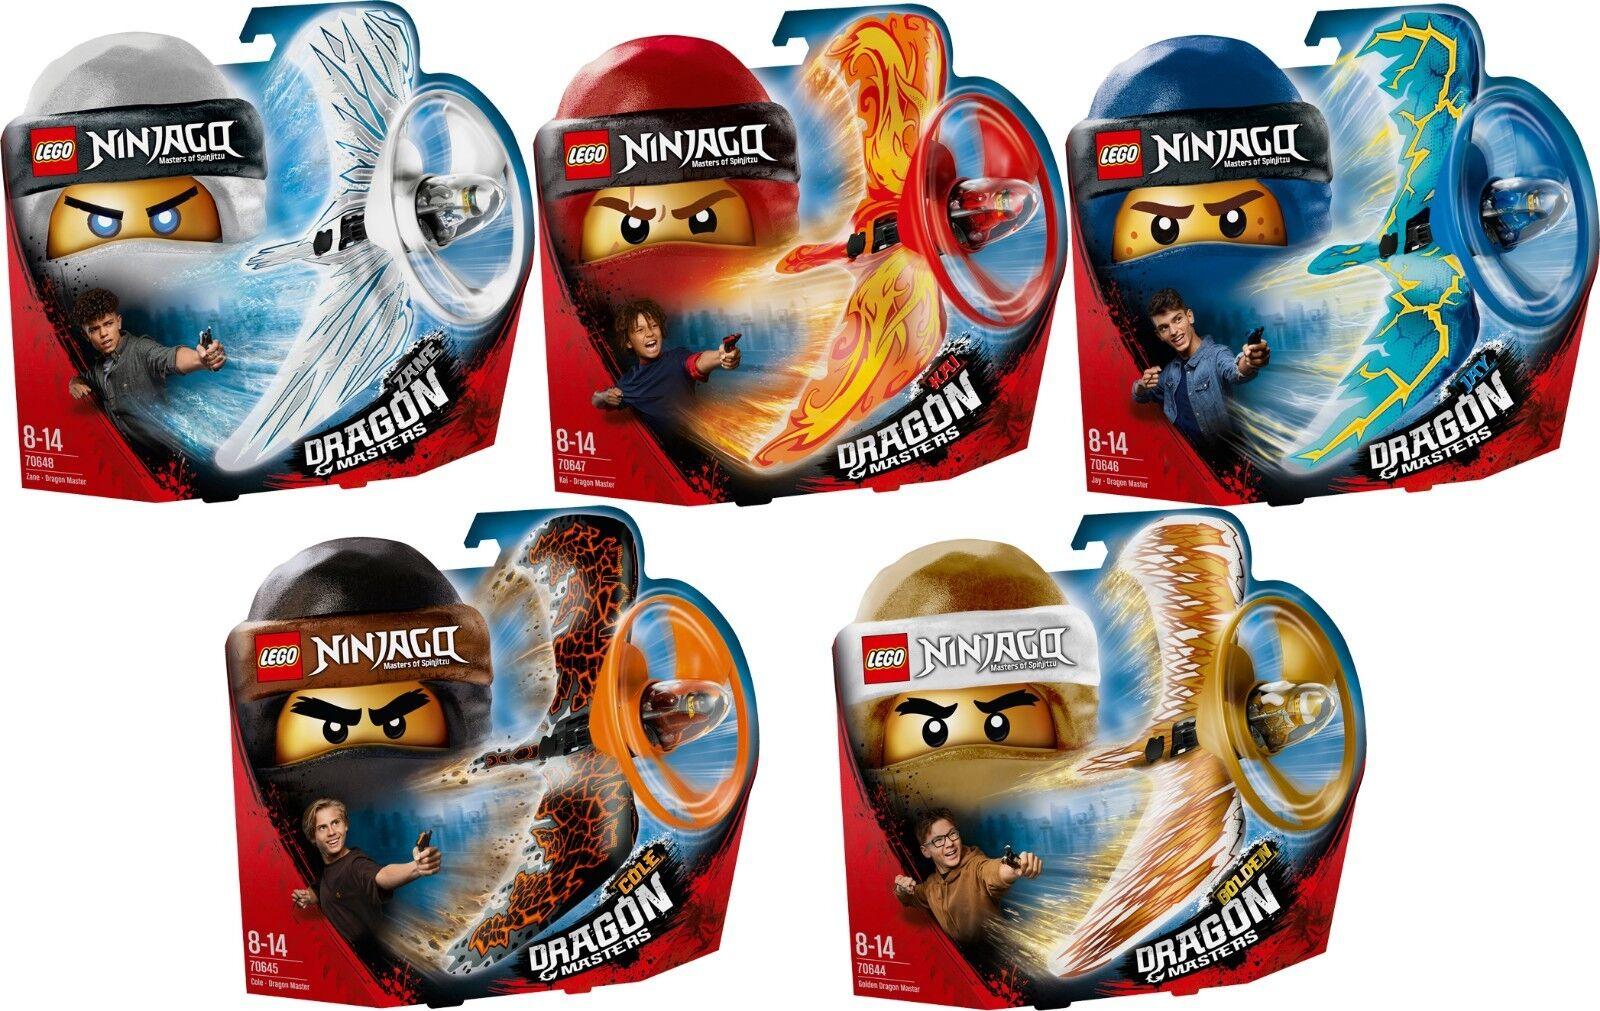 LEGO Ninjago 70648 70647 70646 70645 70644 Drago maestro ACTION TOYS n6/18